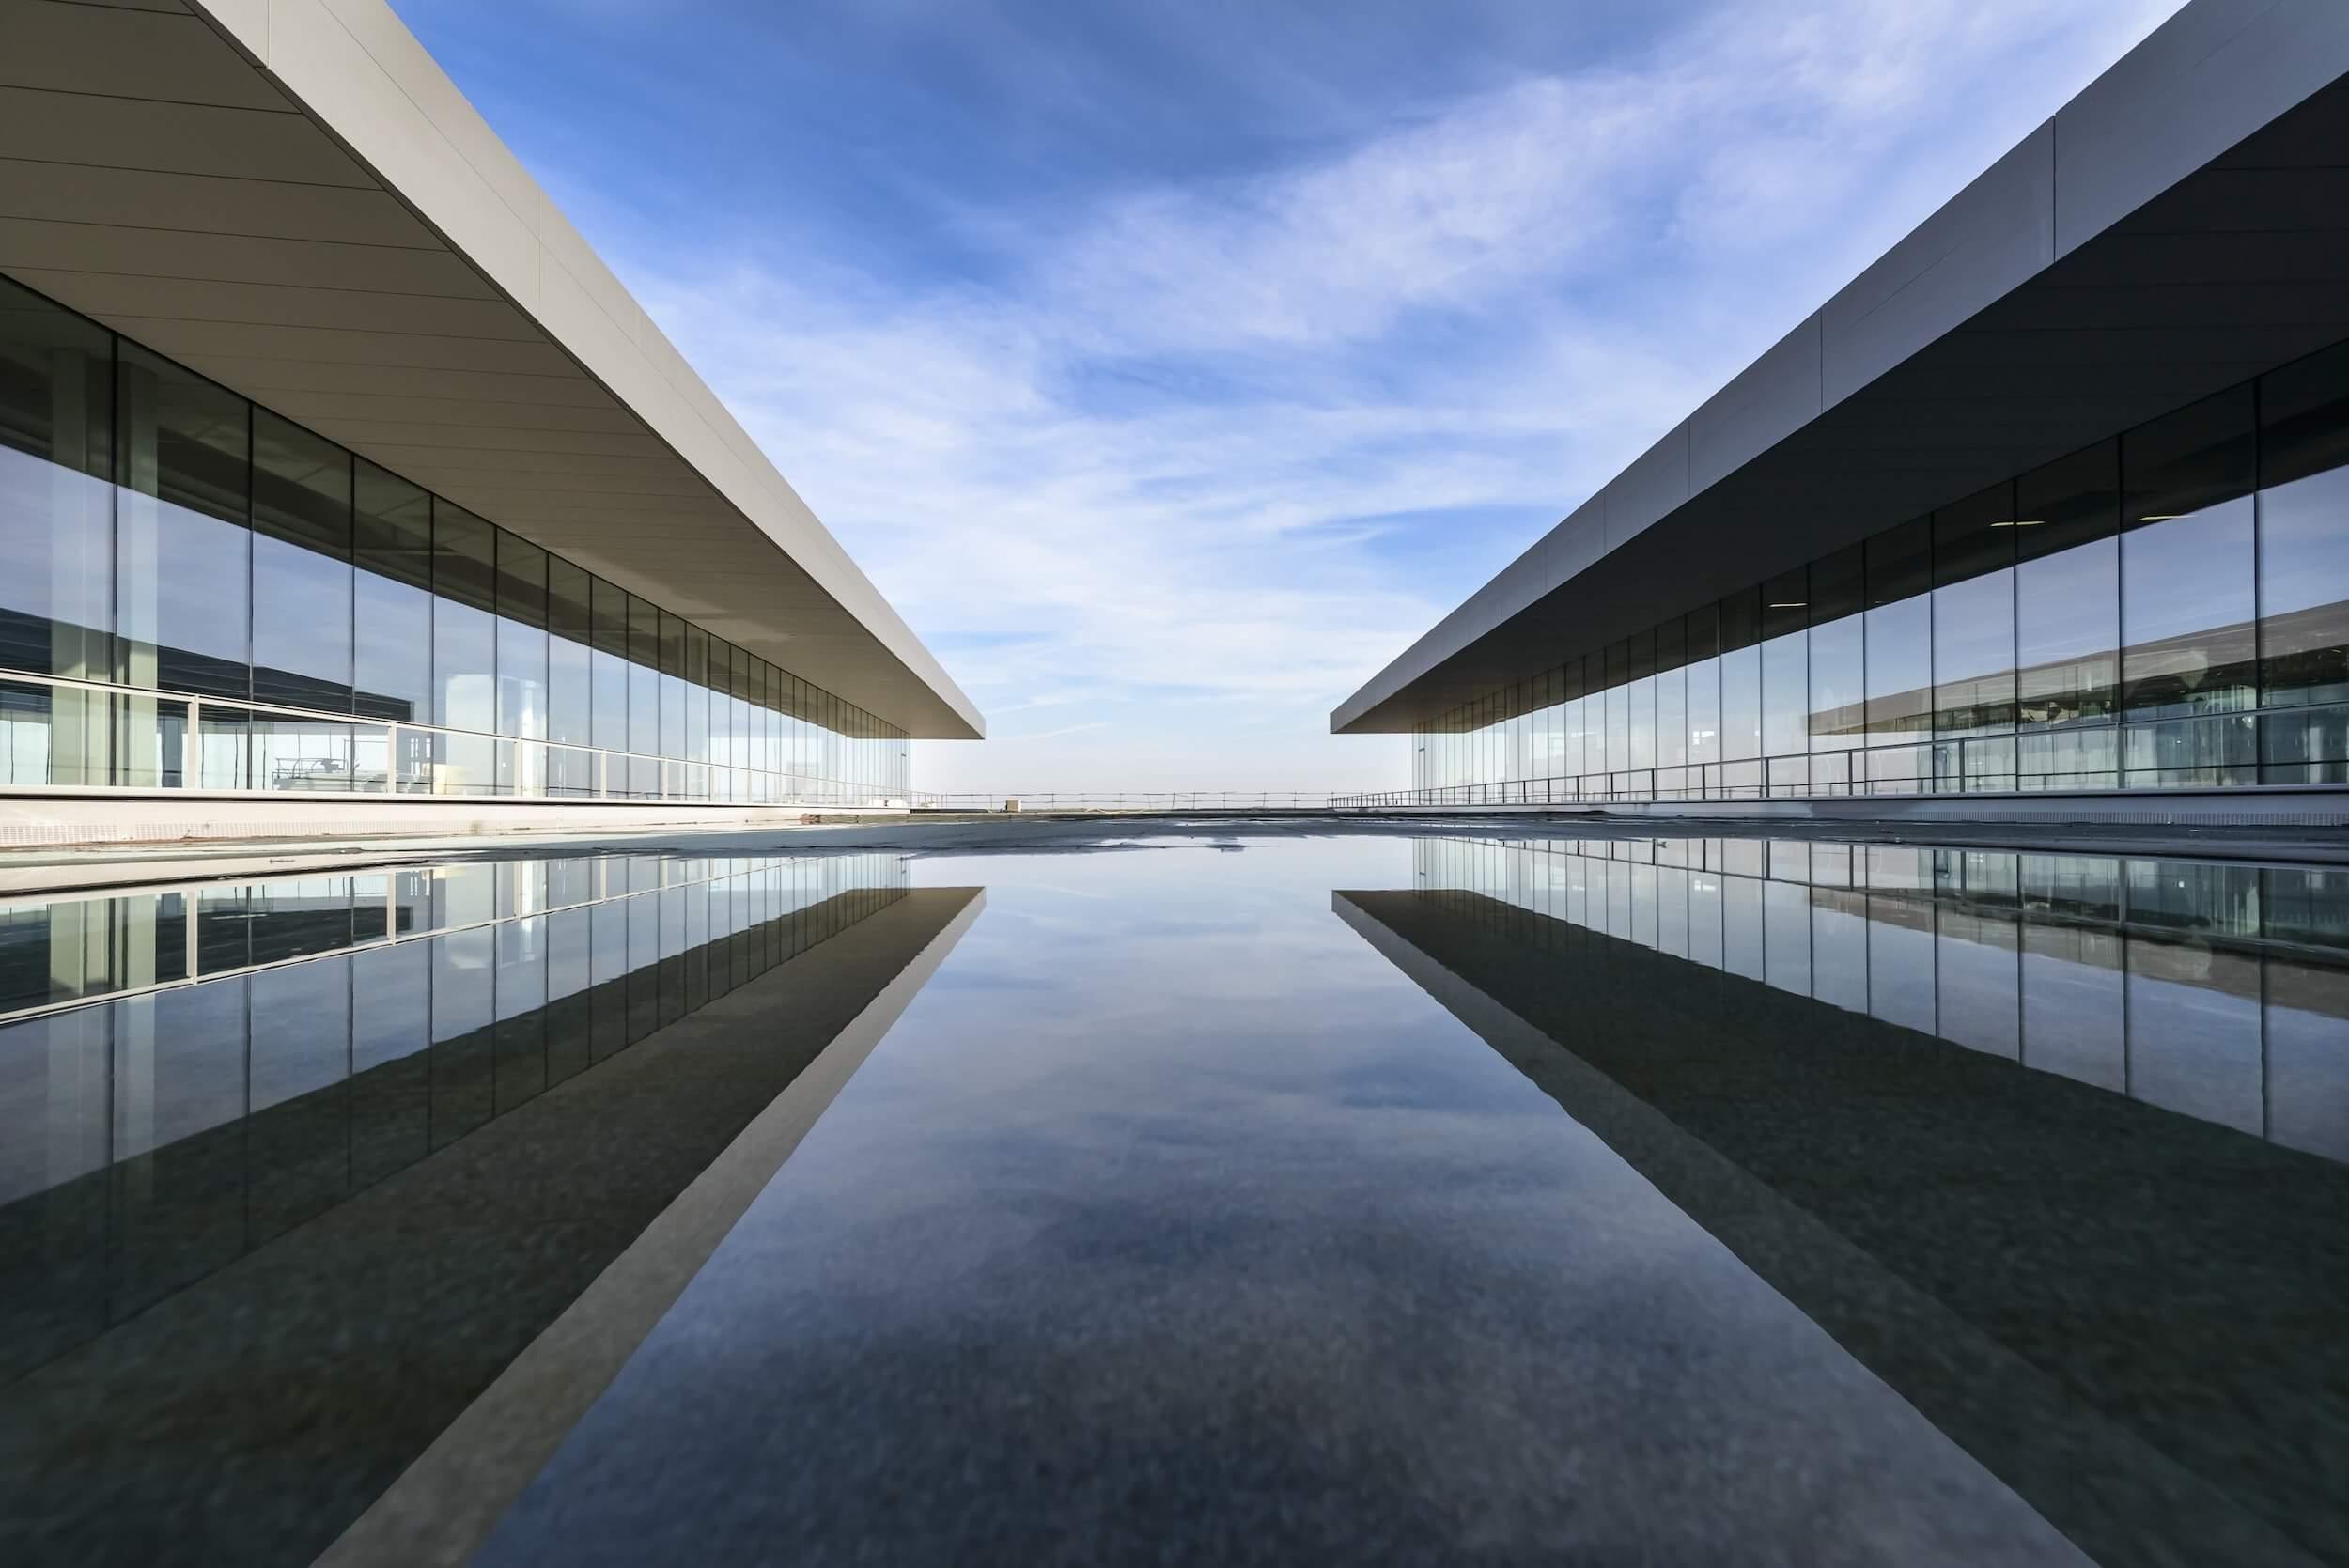 architectural-design-architecture-buildings